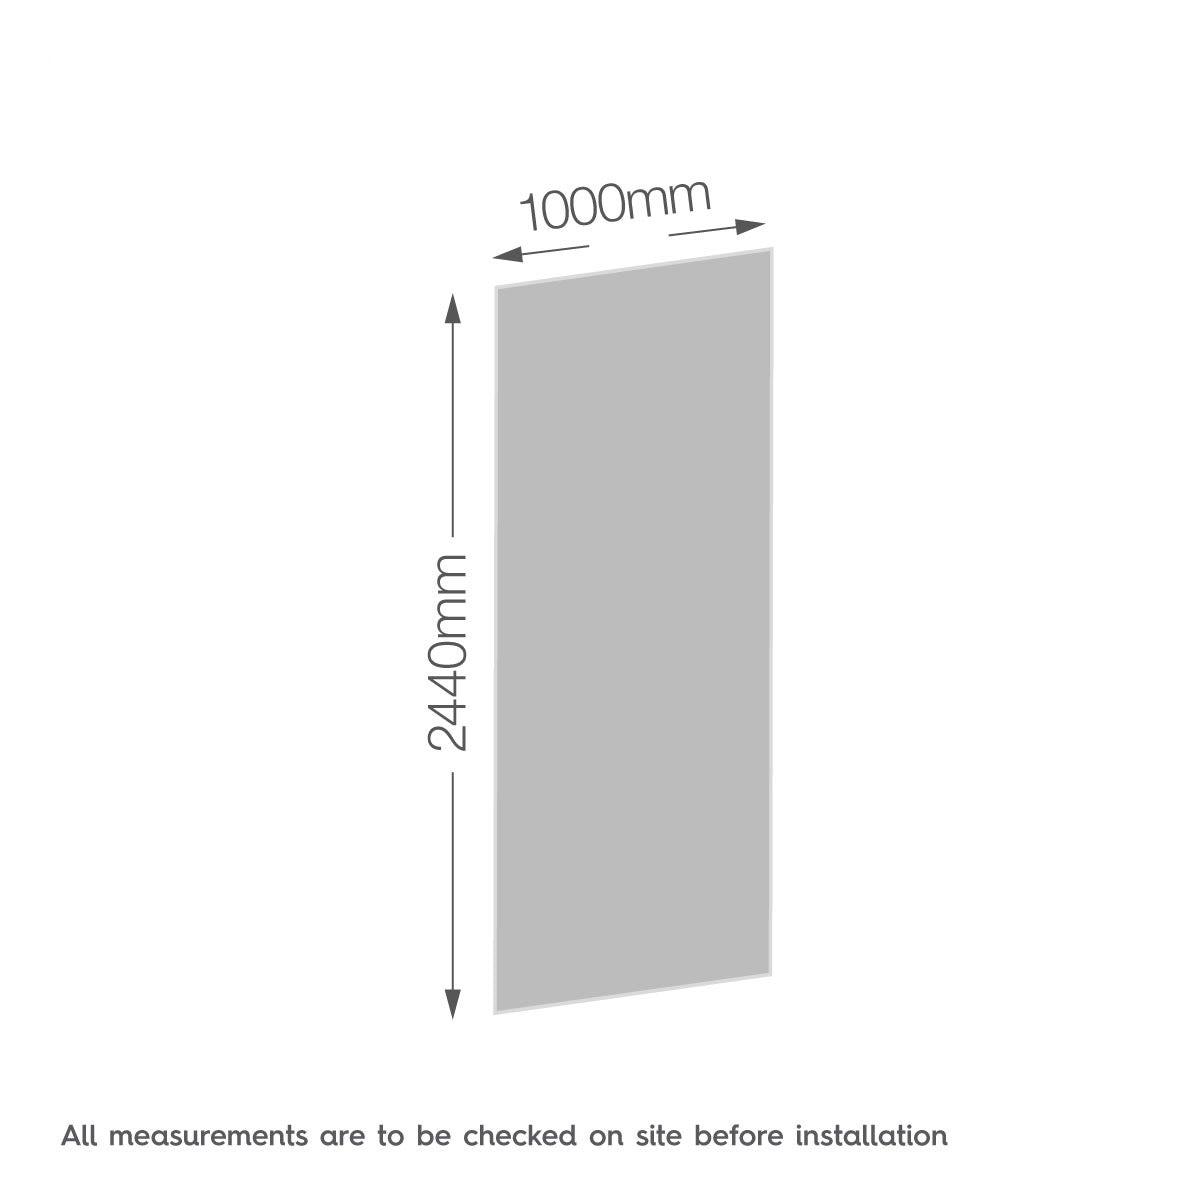 Dimensions for Zenolite plus ash acrylic shower wall panel 2440 x 1000